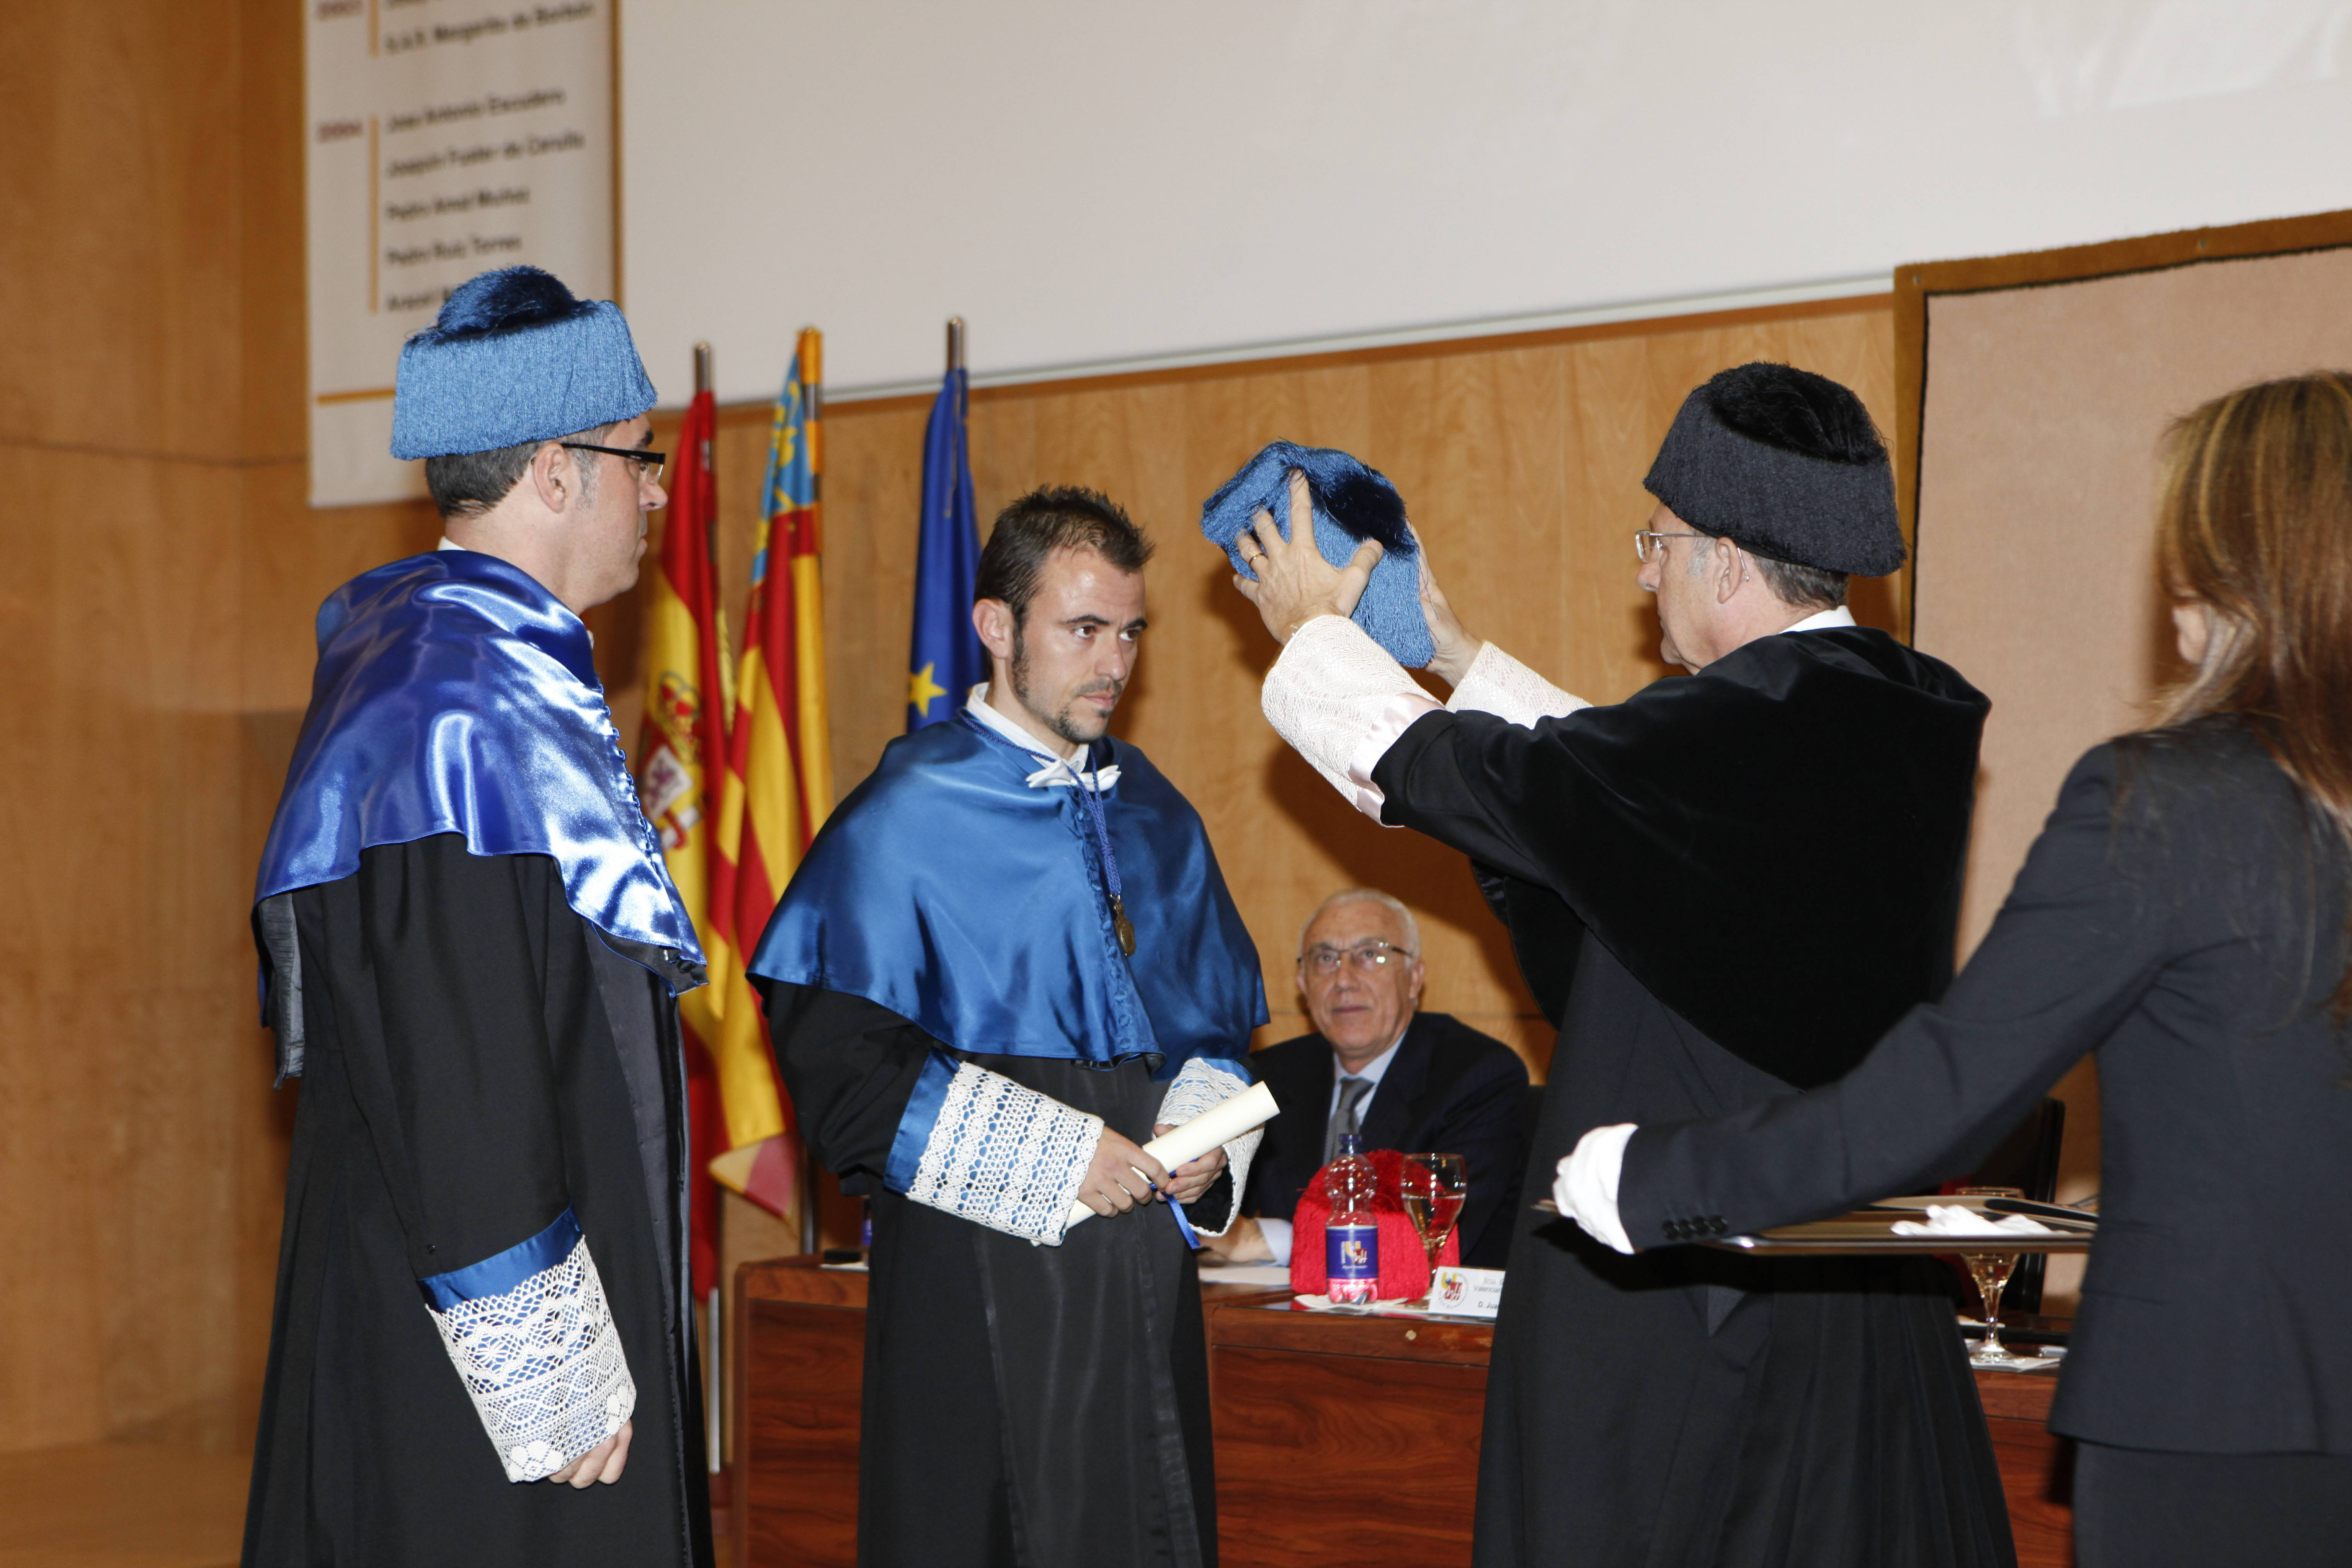 doctor-honoris-causa-luis-gamir_mg_1143.jpg